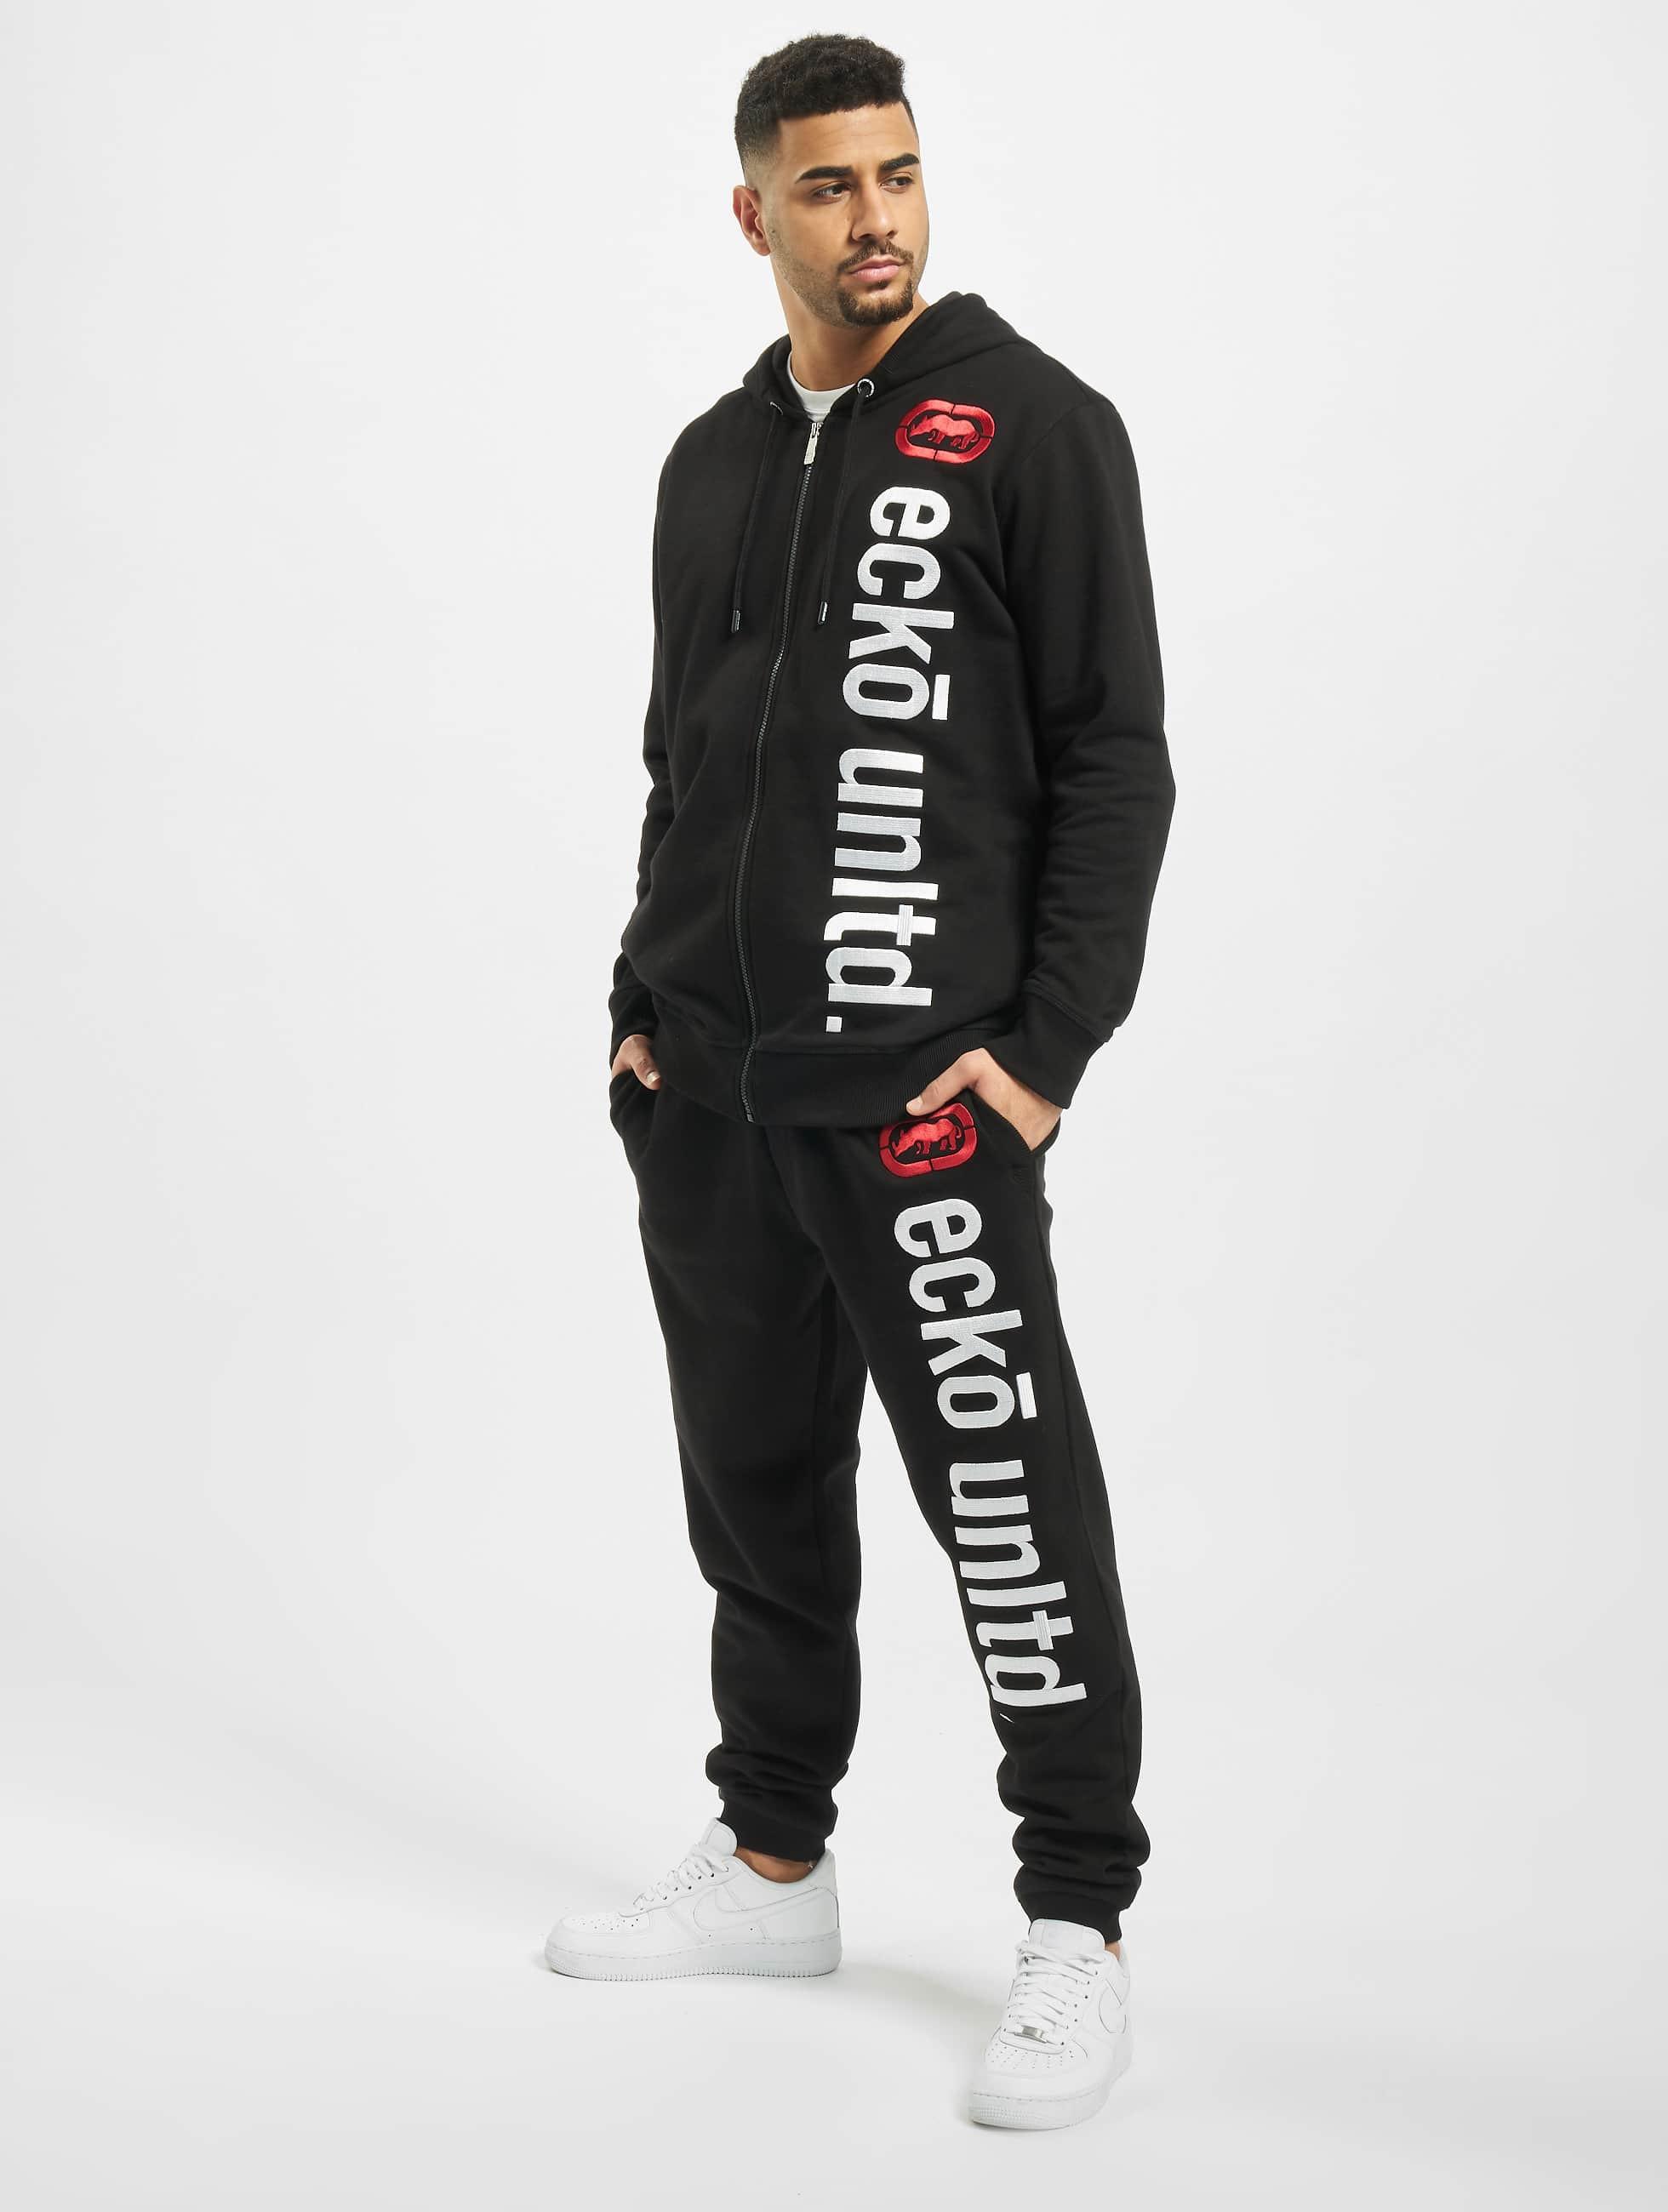 Ecko Unltd. / Suits 2 Face in black S